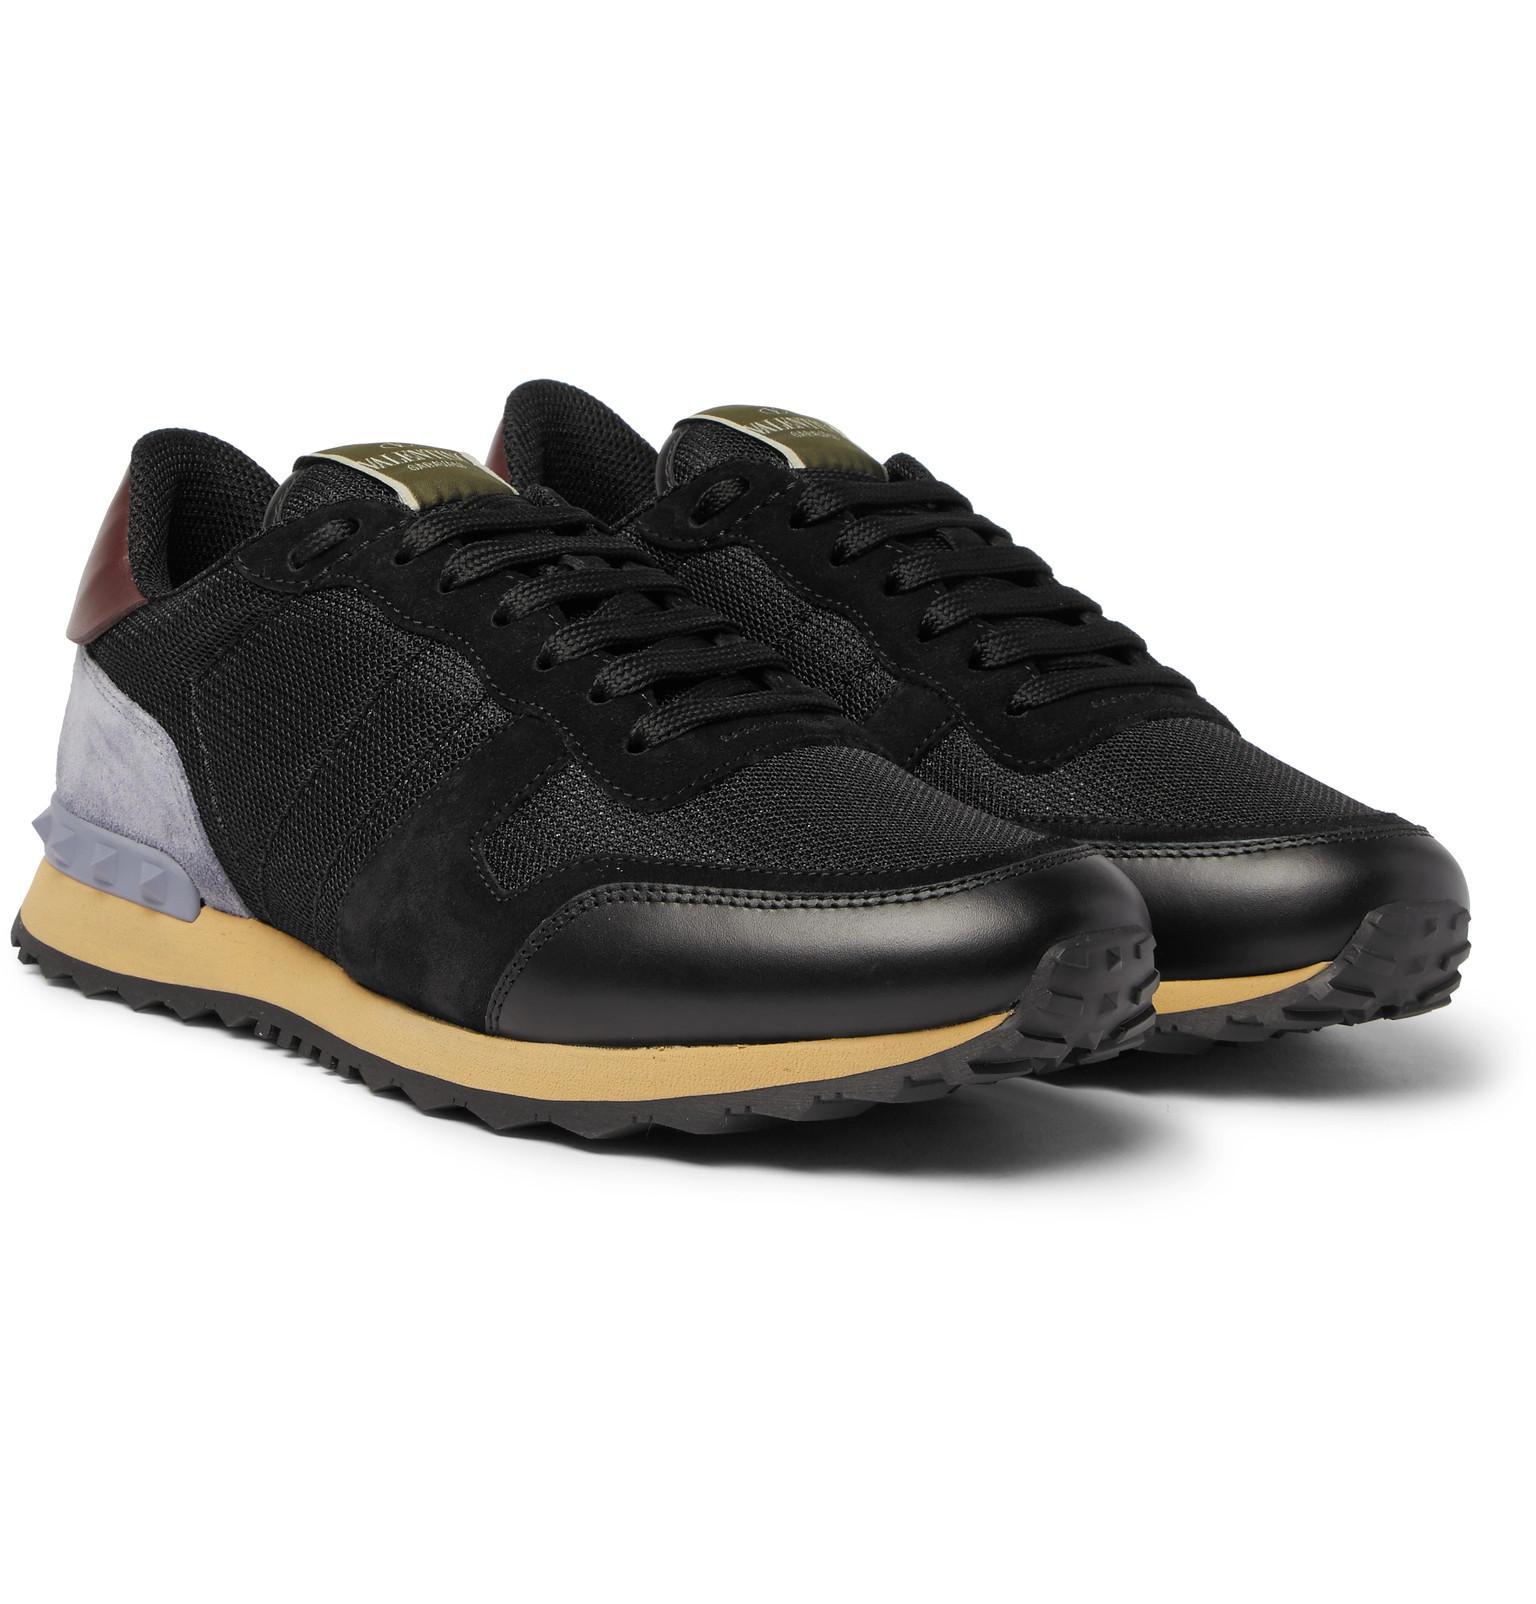 Garavani Rockrunner Mesh, Leather And Suede Sneakers Valentino